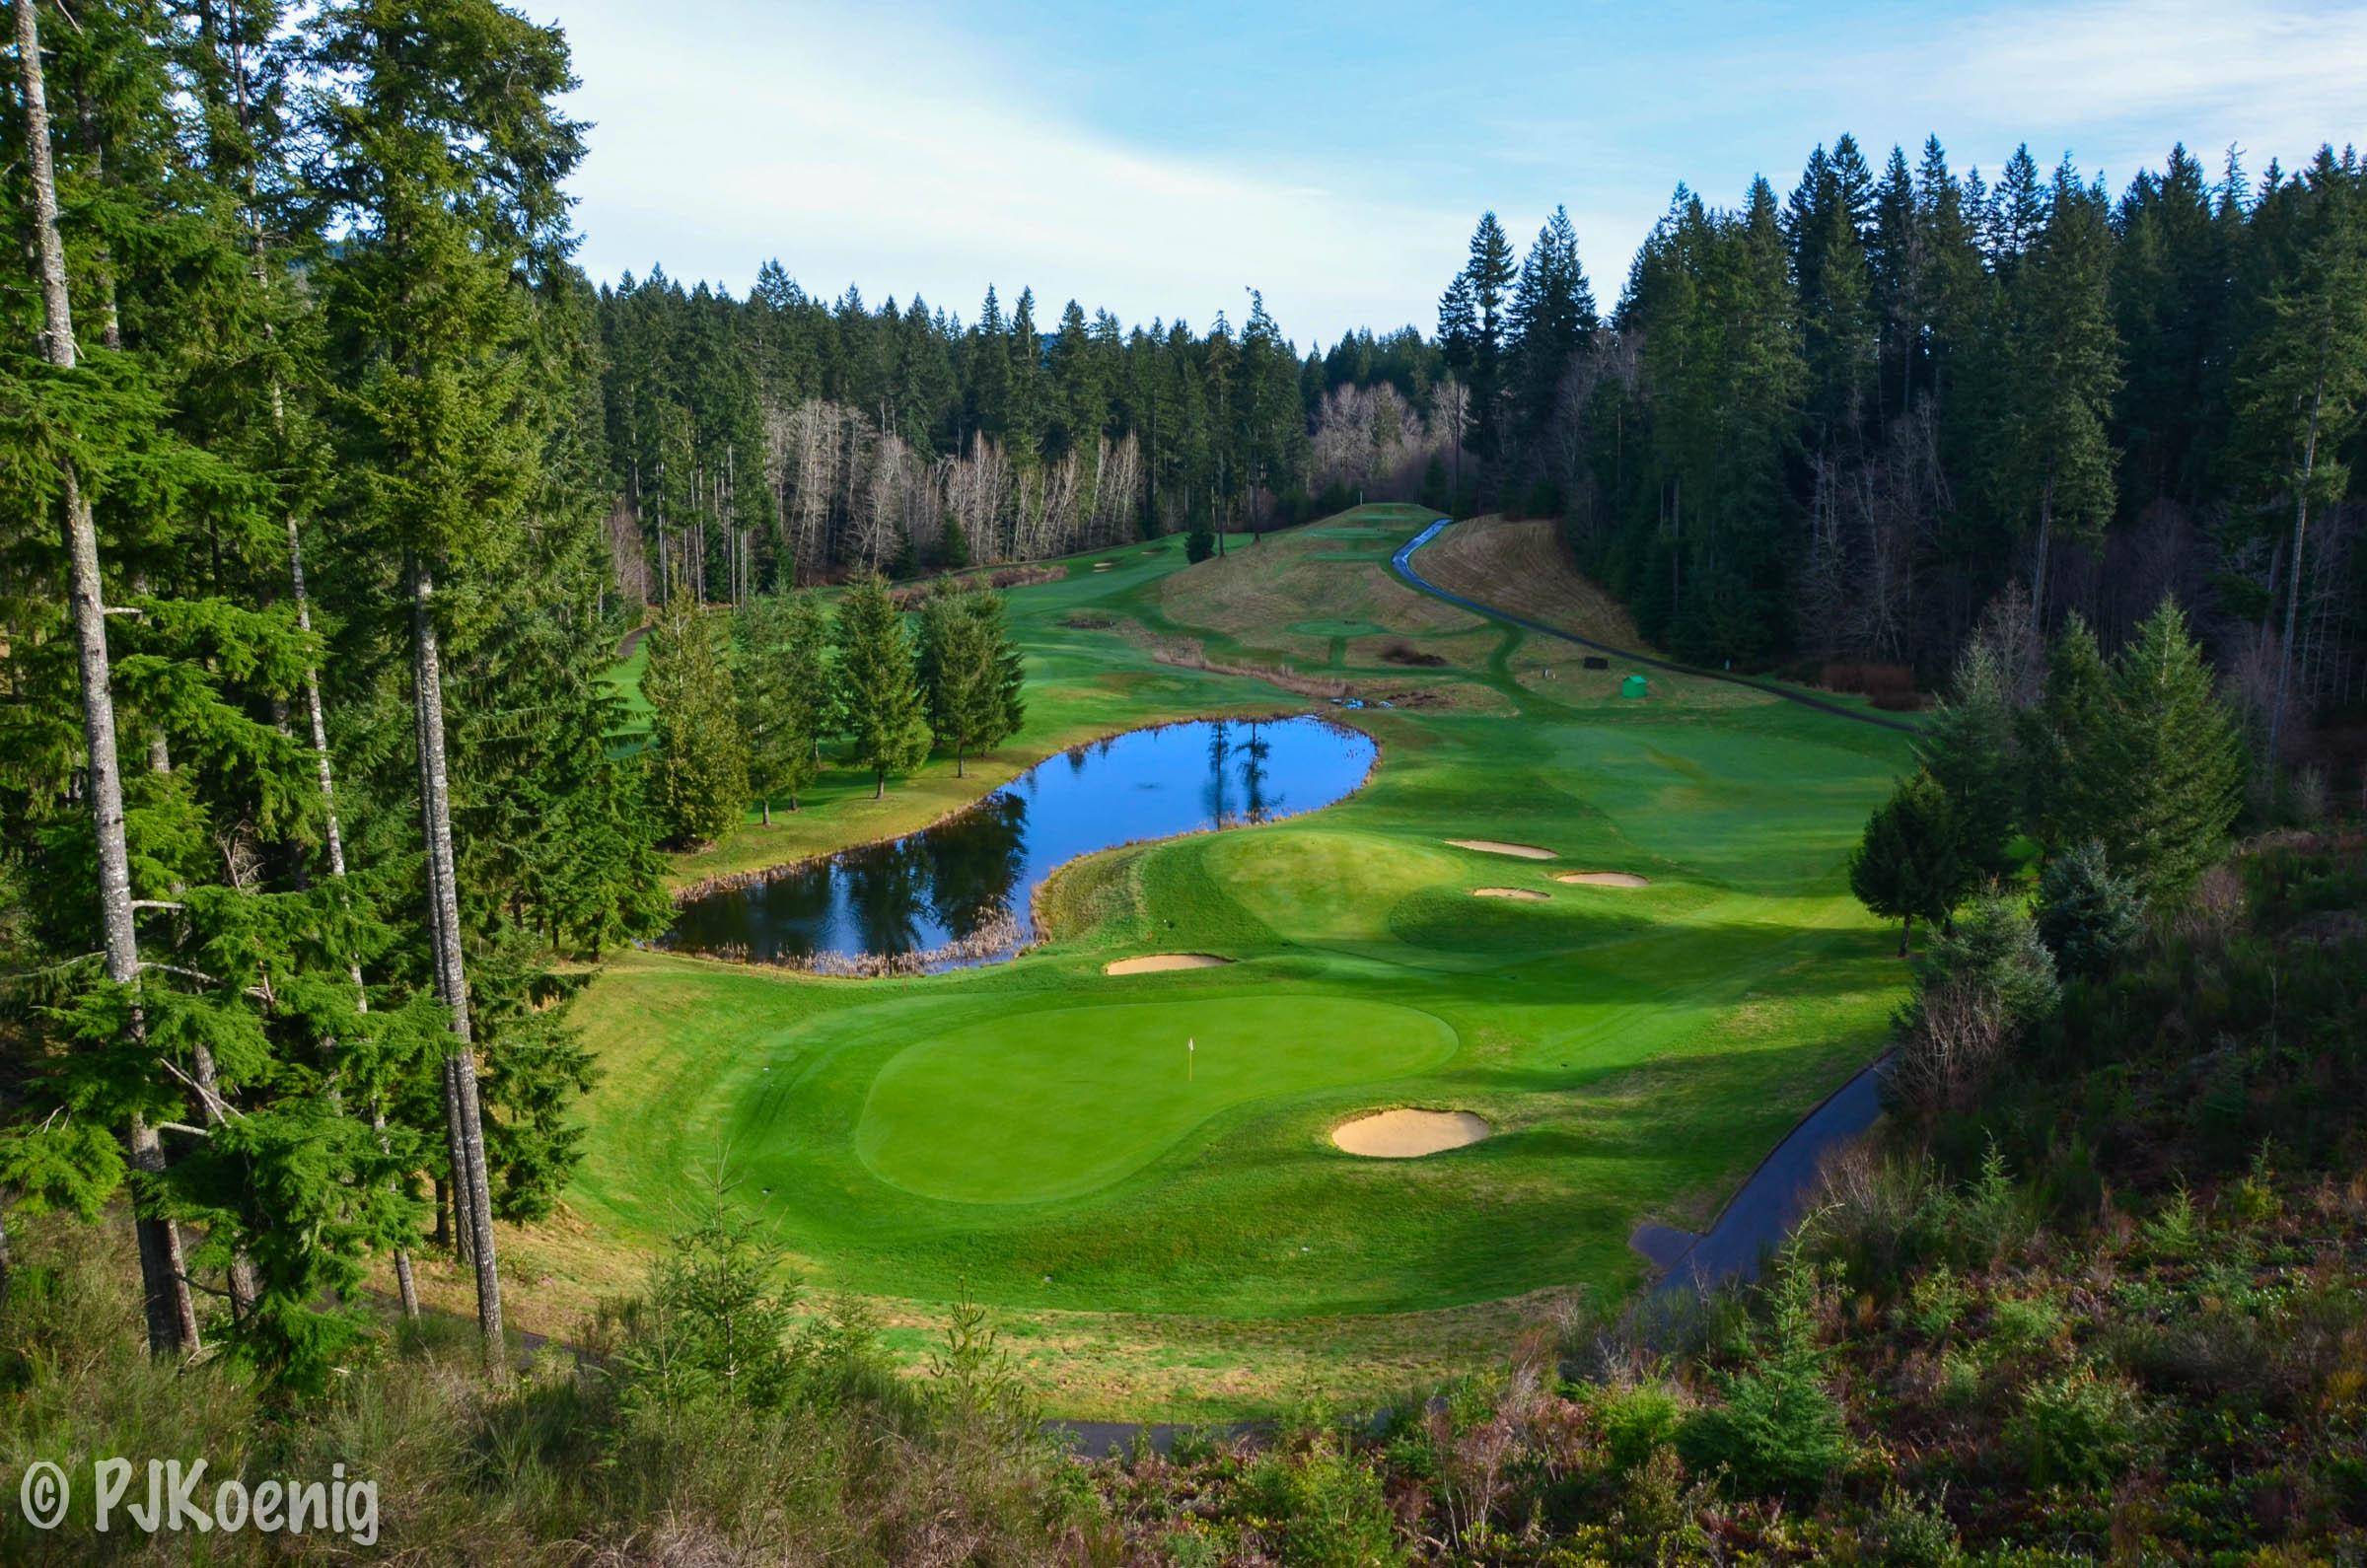 Gold Mountain Golf Club - Bremerton, WA